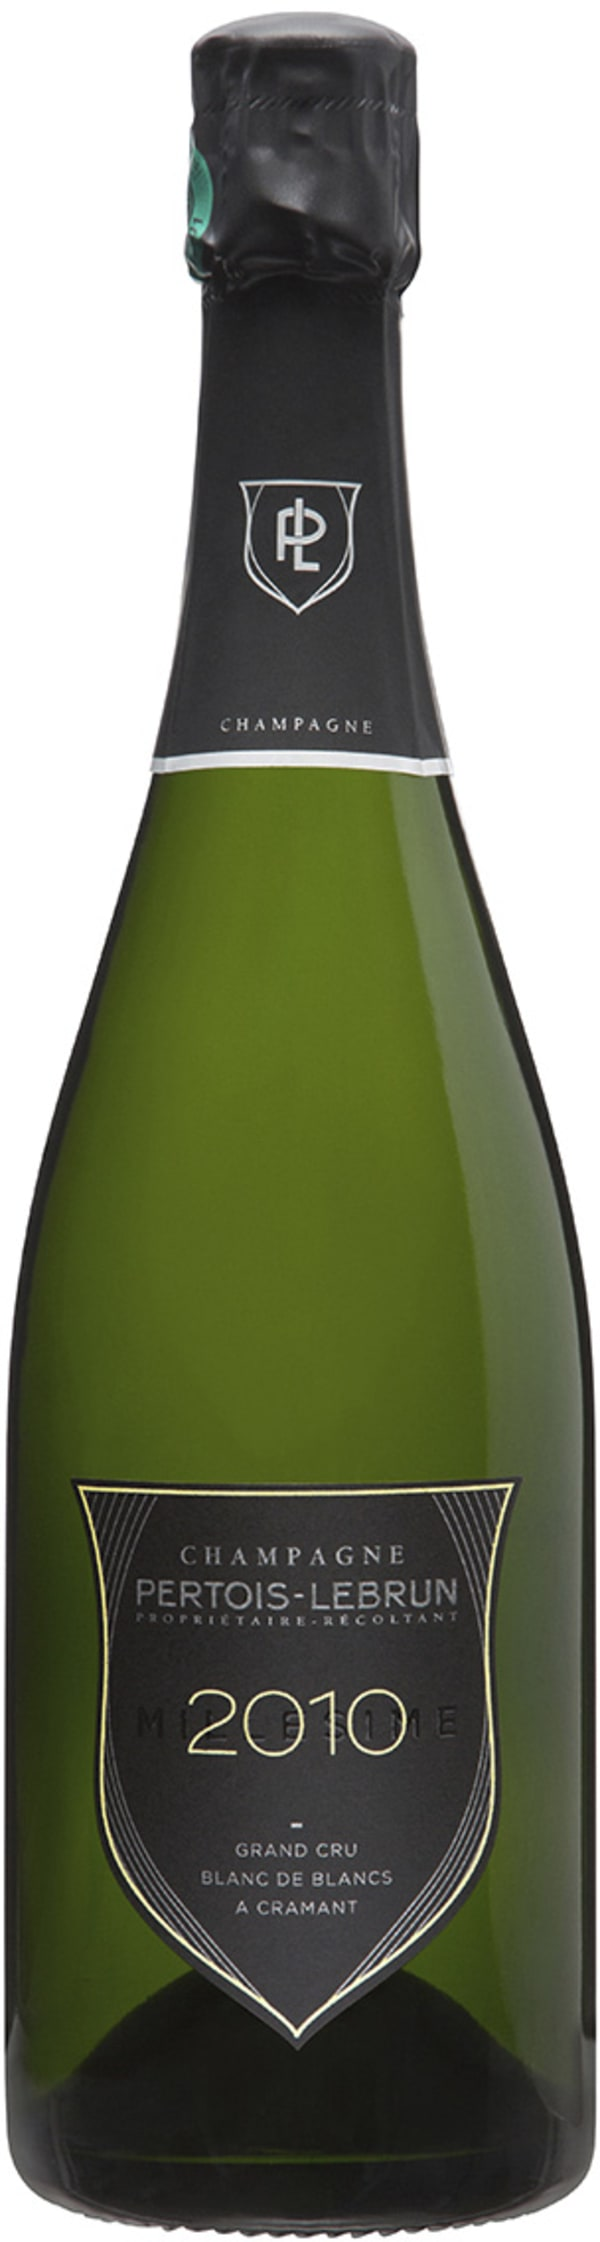 Pertois-LeBrun Grand Cru Blanc de Blancs Millésimé Champagne Extra-Brut 2010